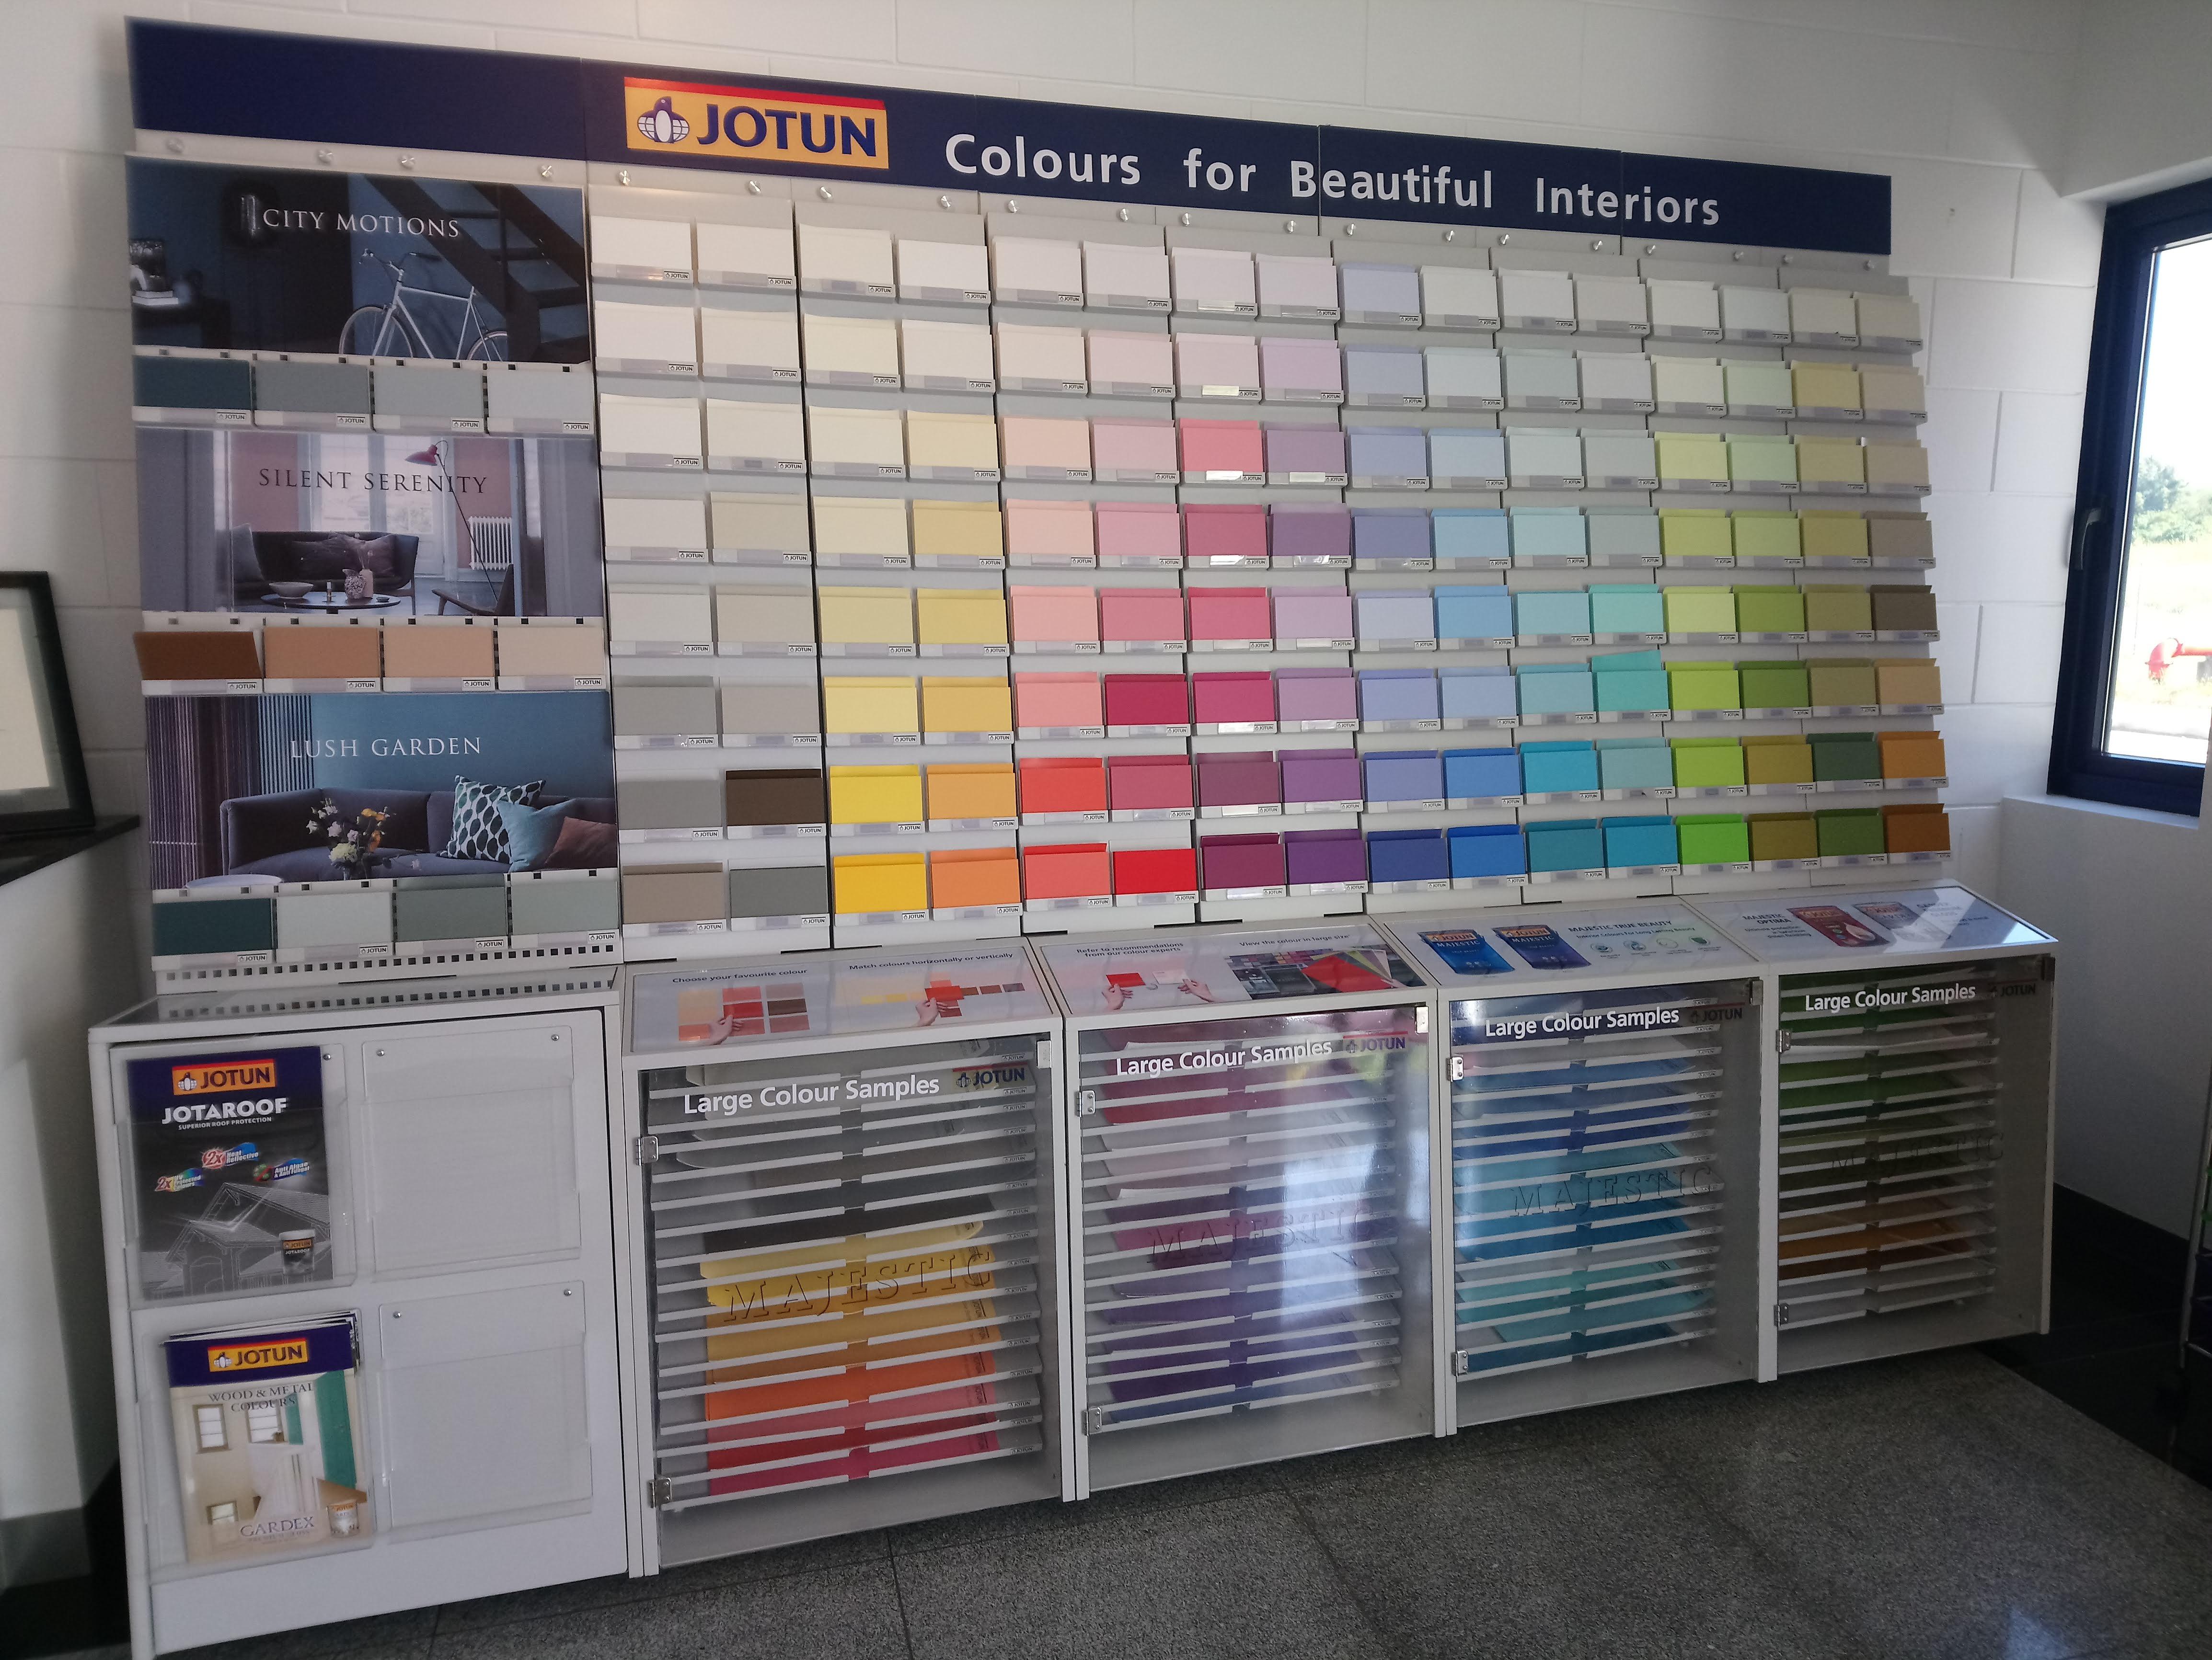 jotun-colors